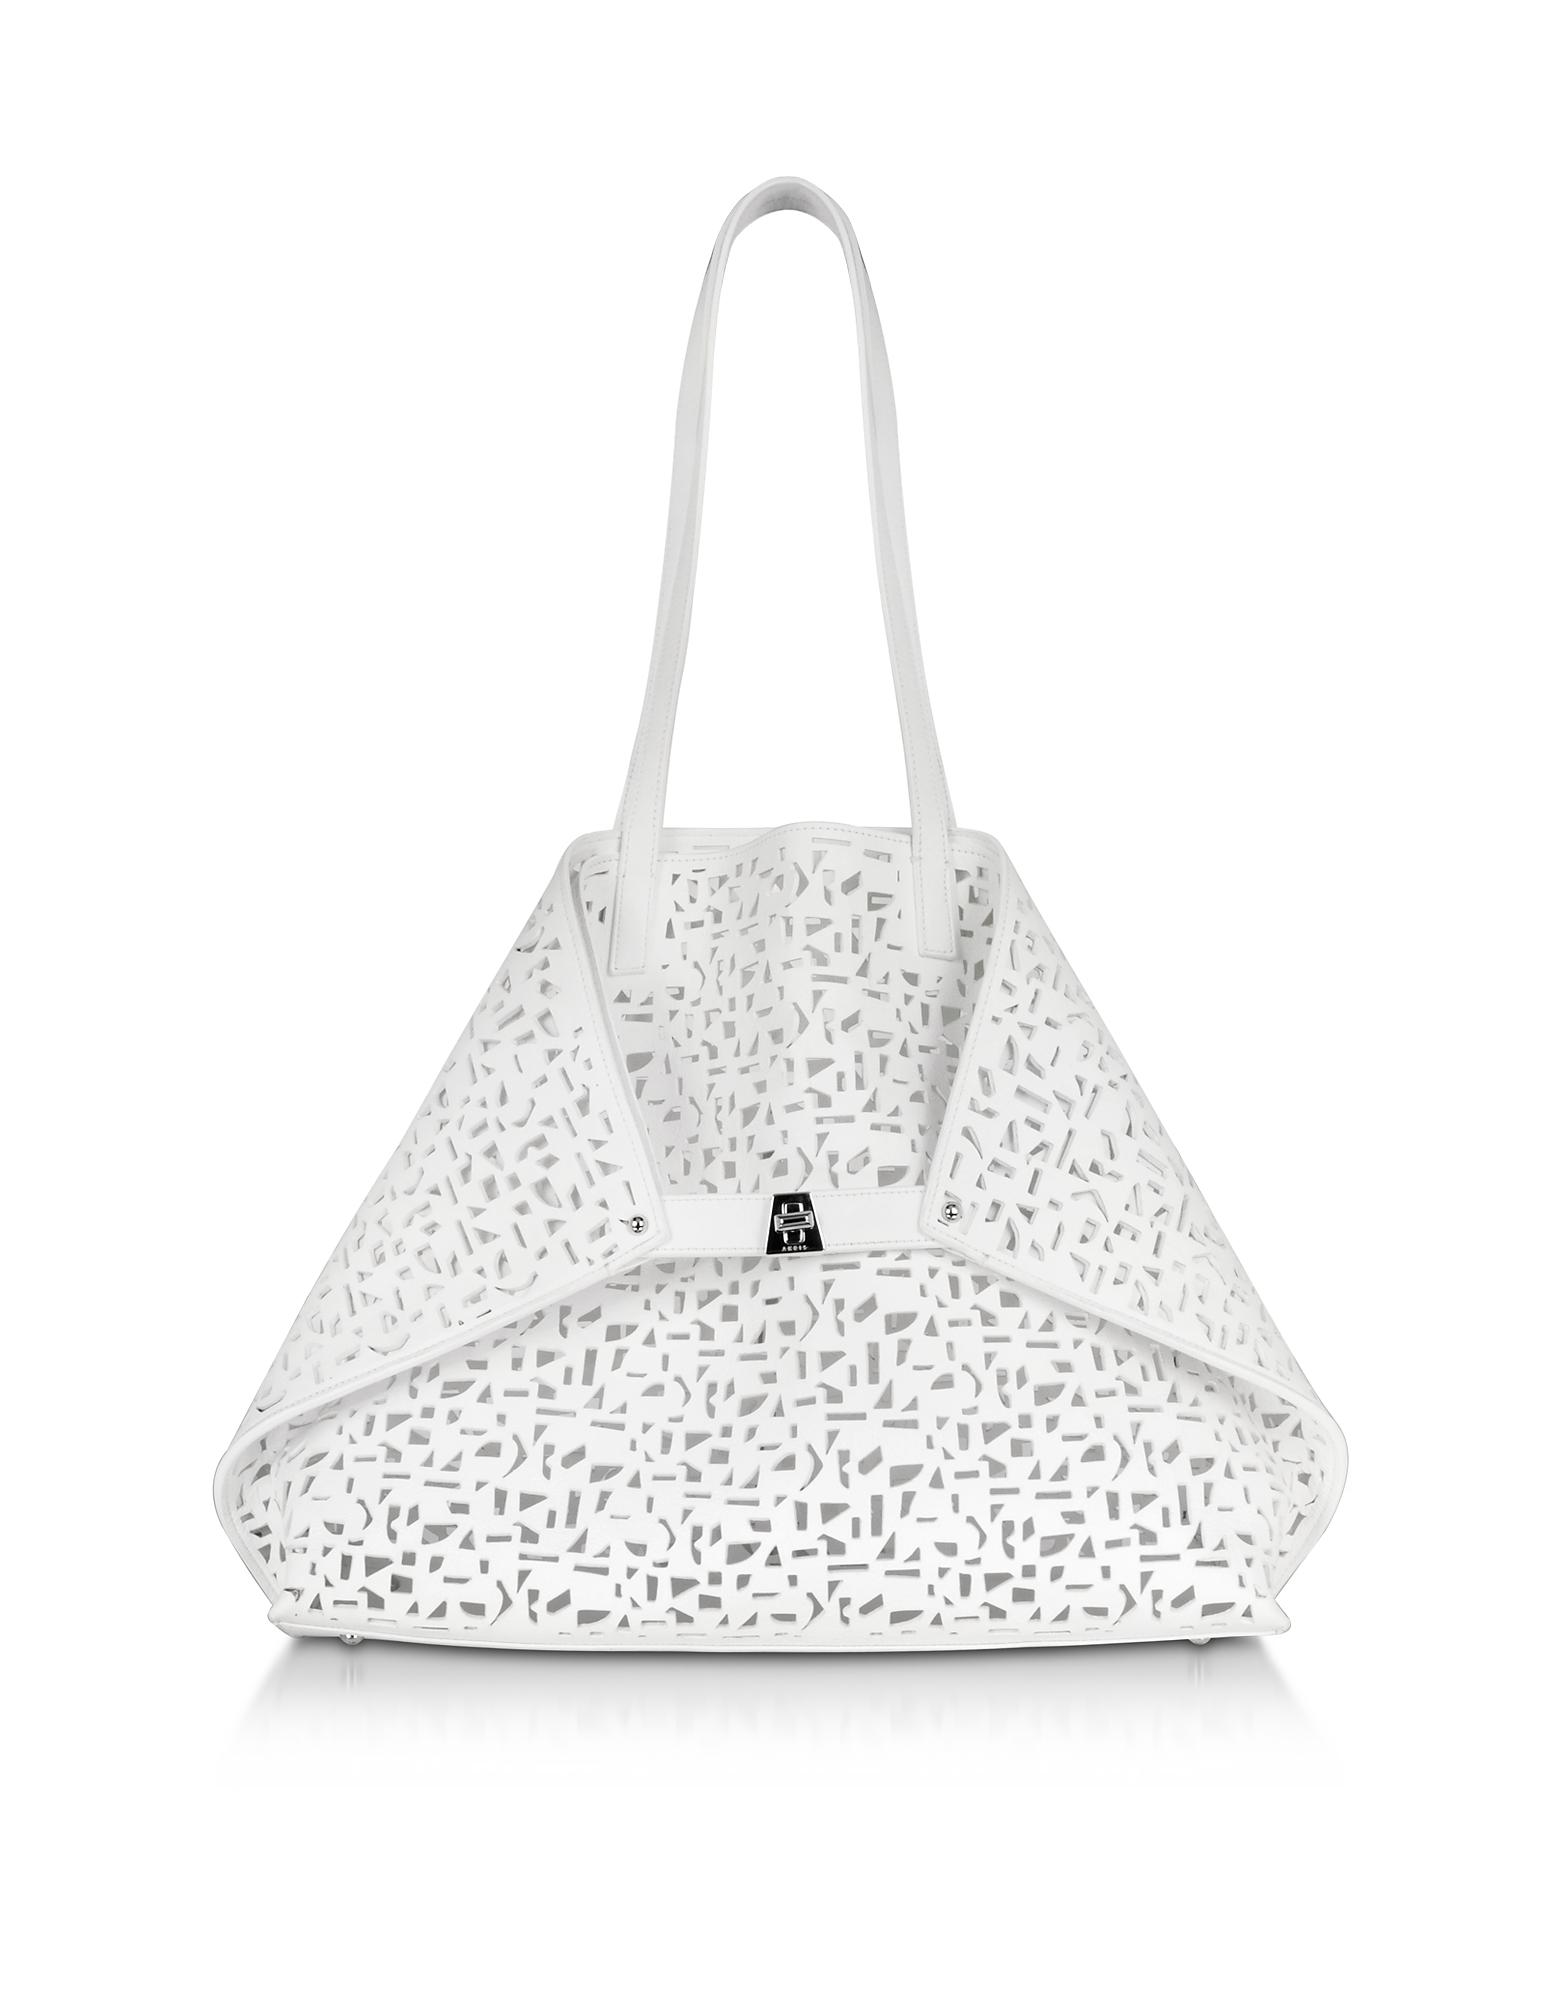 Image of Ai Medium Shopper in Pelle Laser Cut Out Bianco Ottico